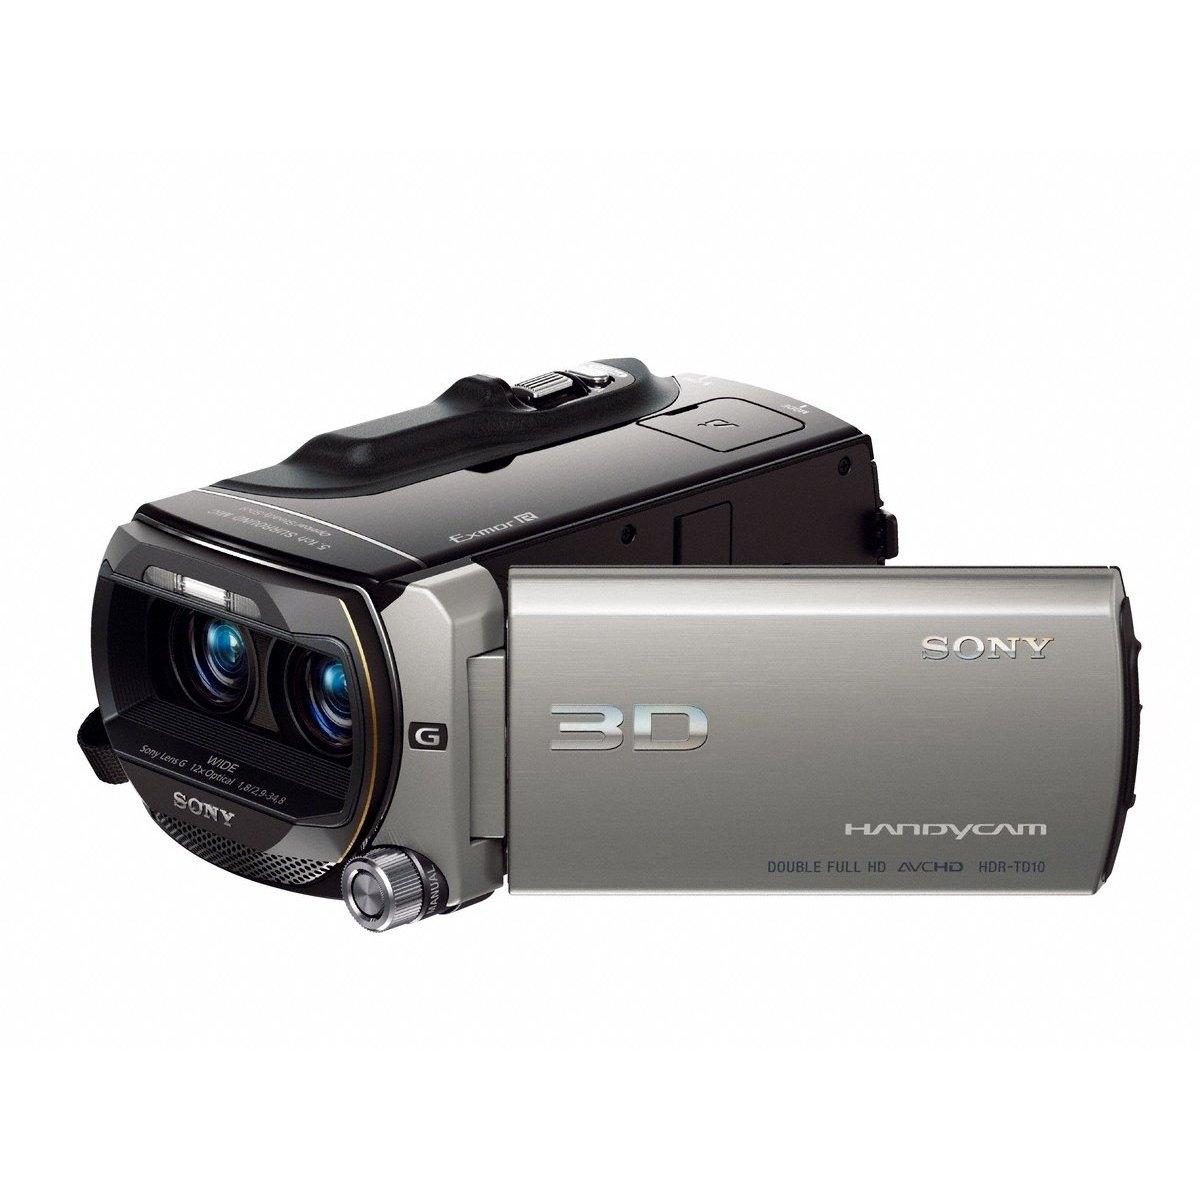 camcorder buying guide saving moving memories alatest blog rh alatest com Nikon Digital Camera Digital Camera Batteries